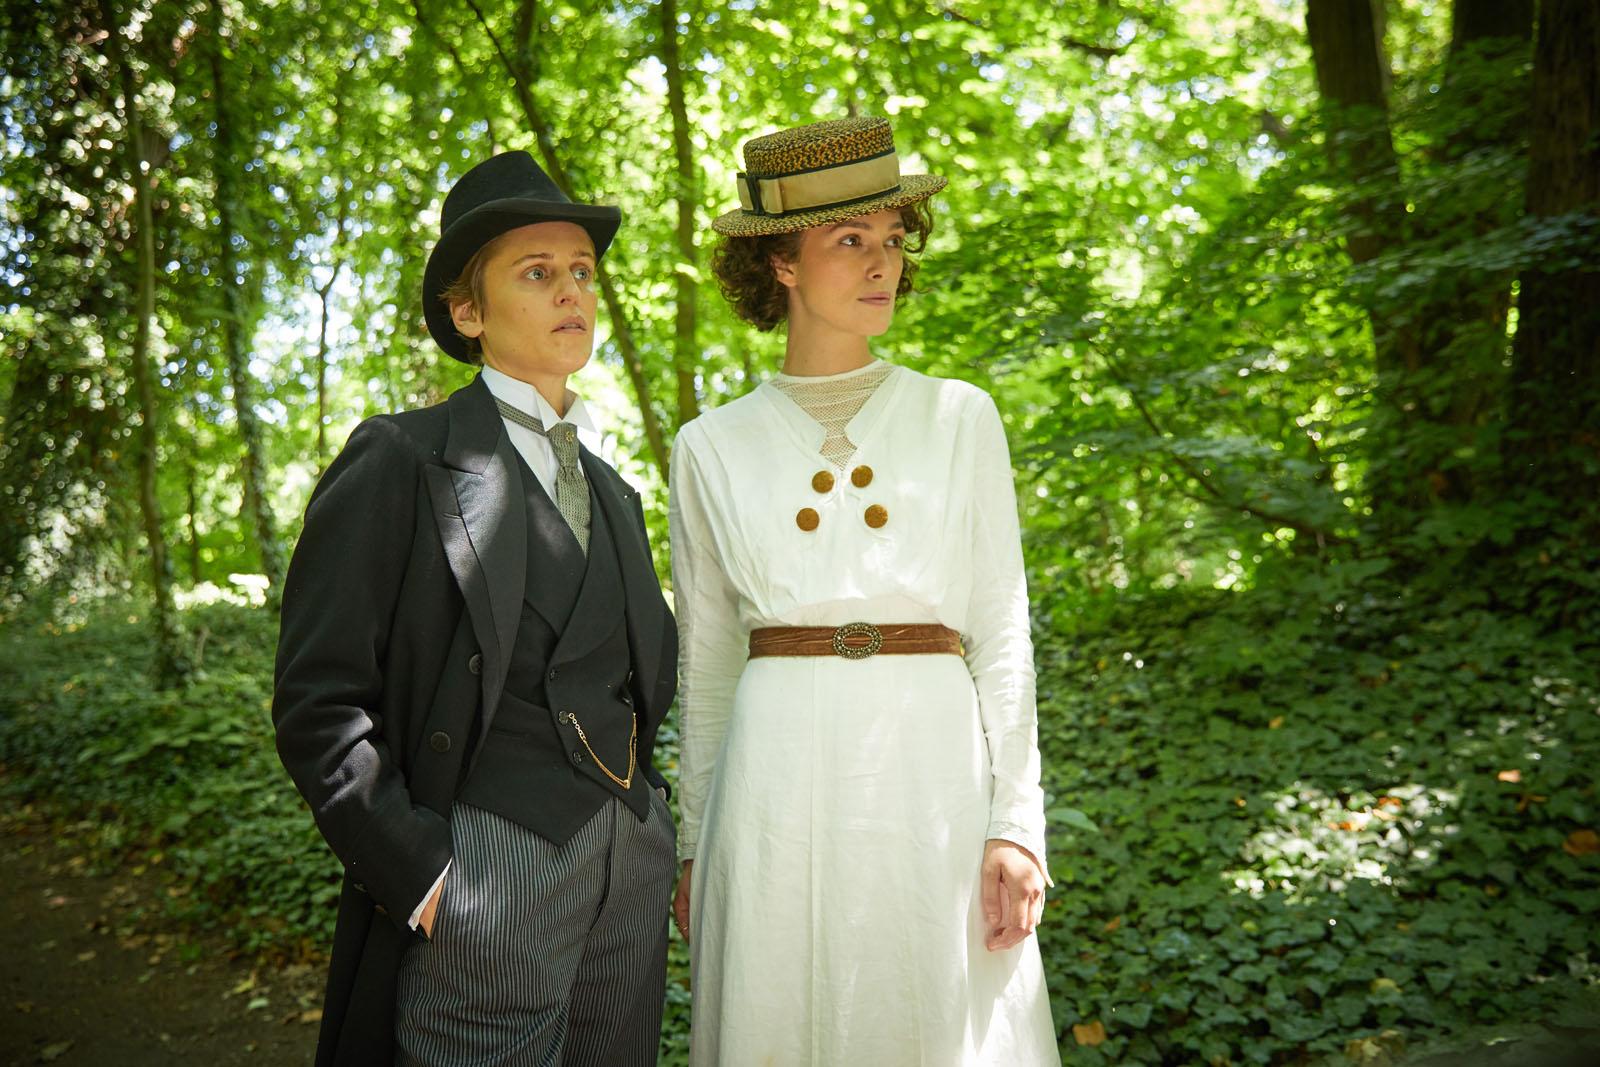 Colette critique photo avis cinema film Keira Knightley denise Gough